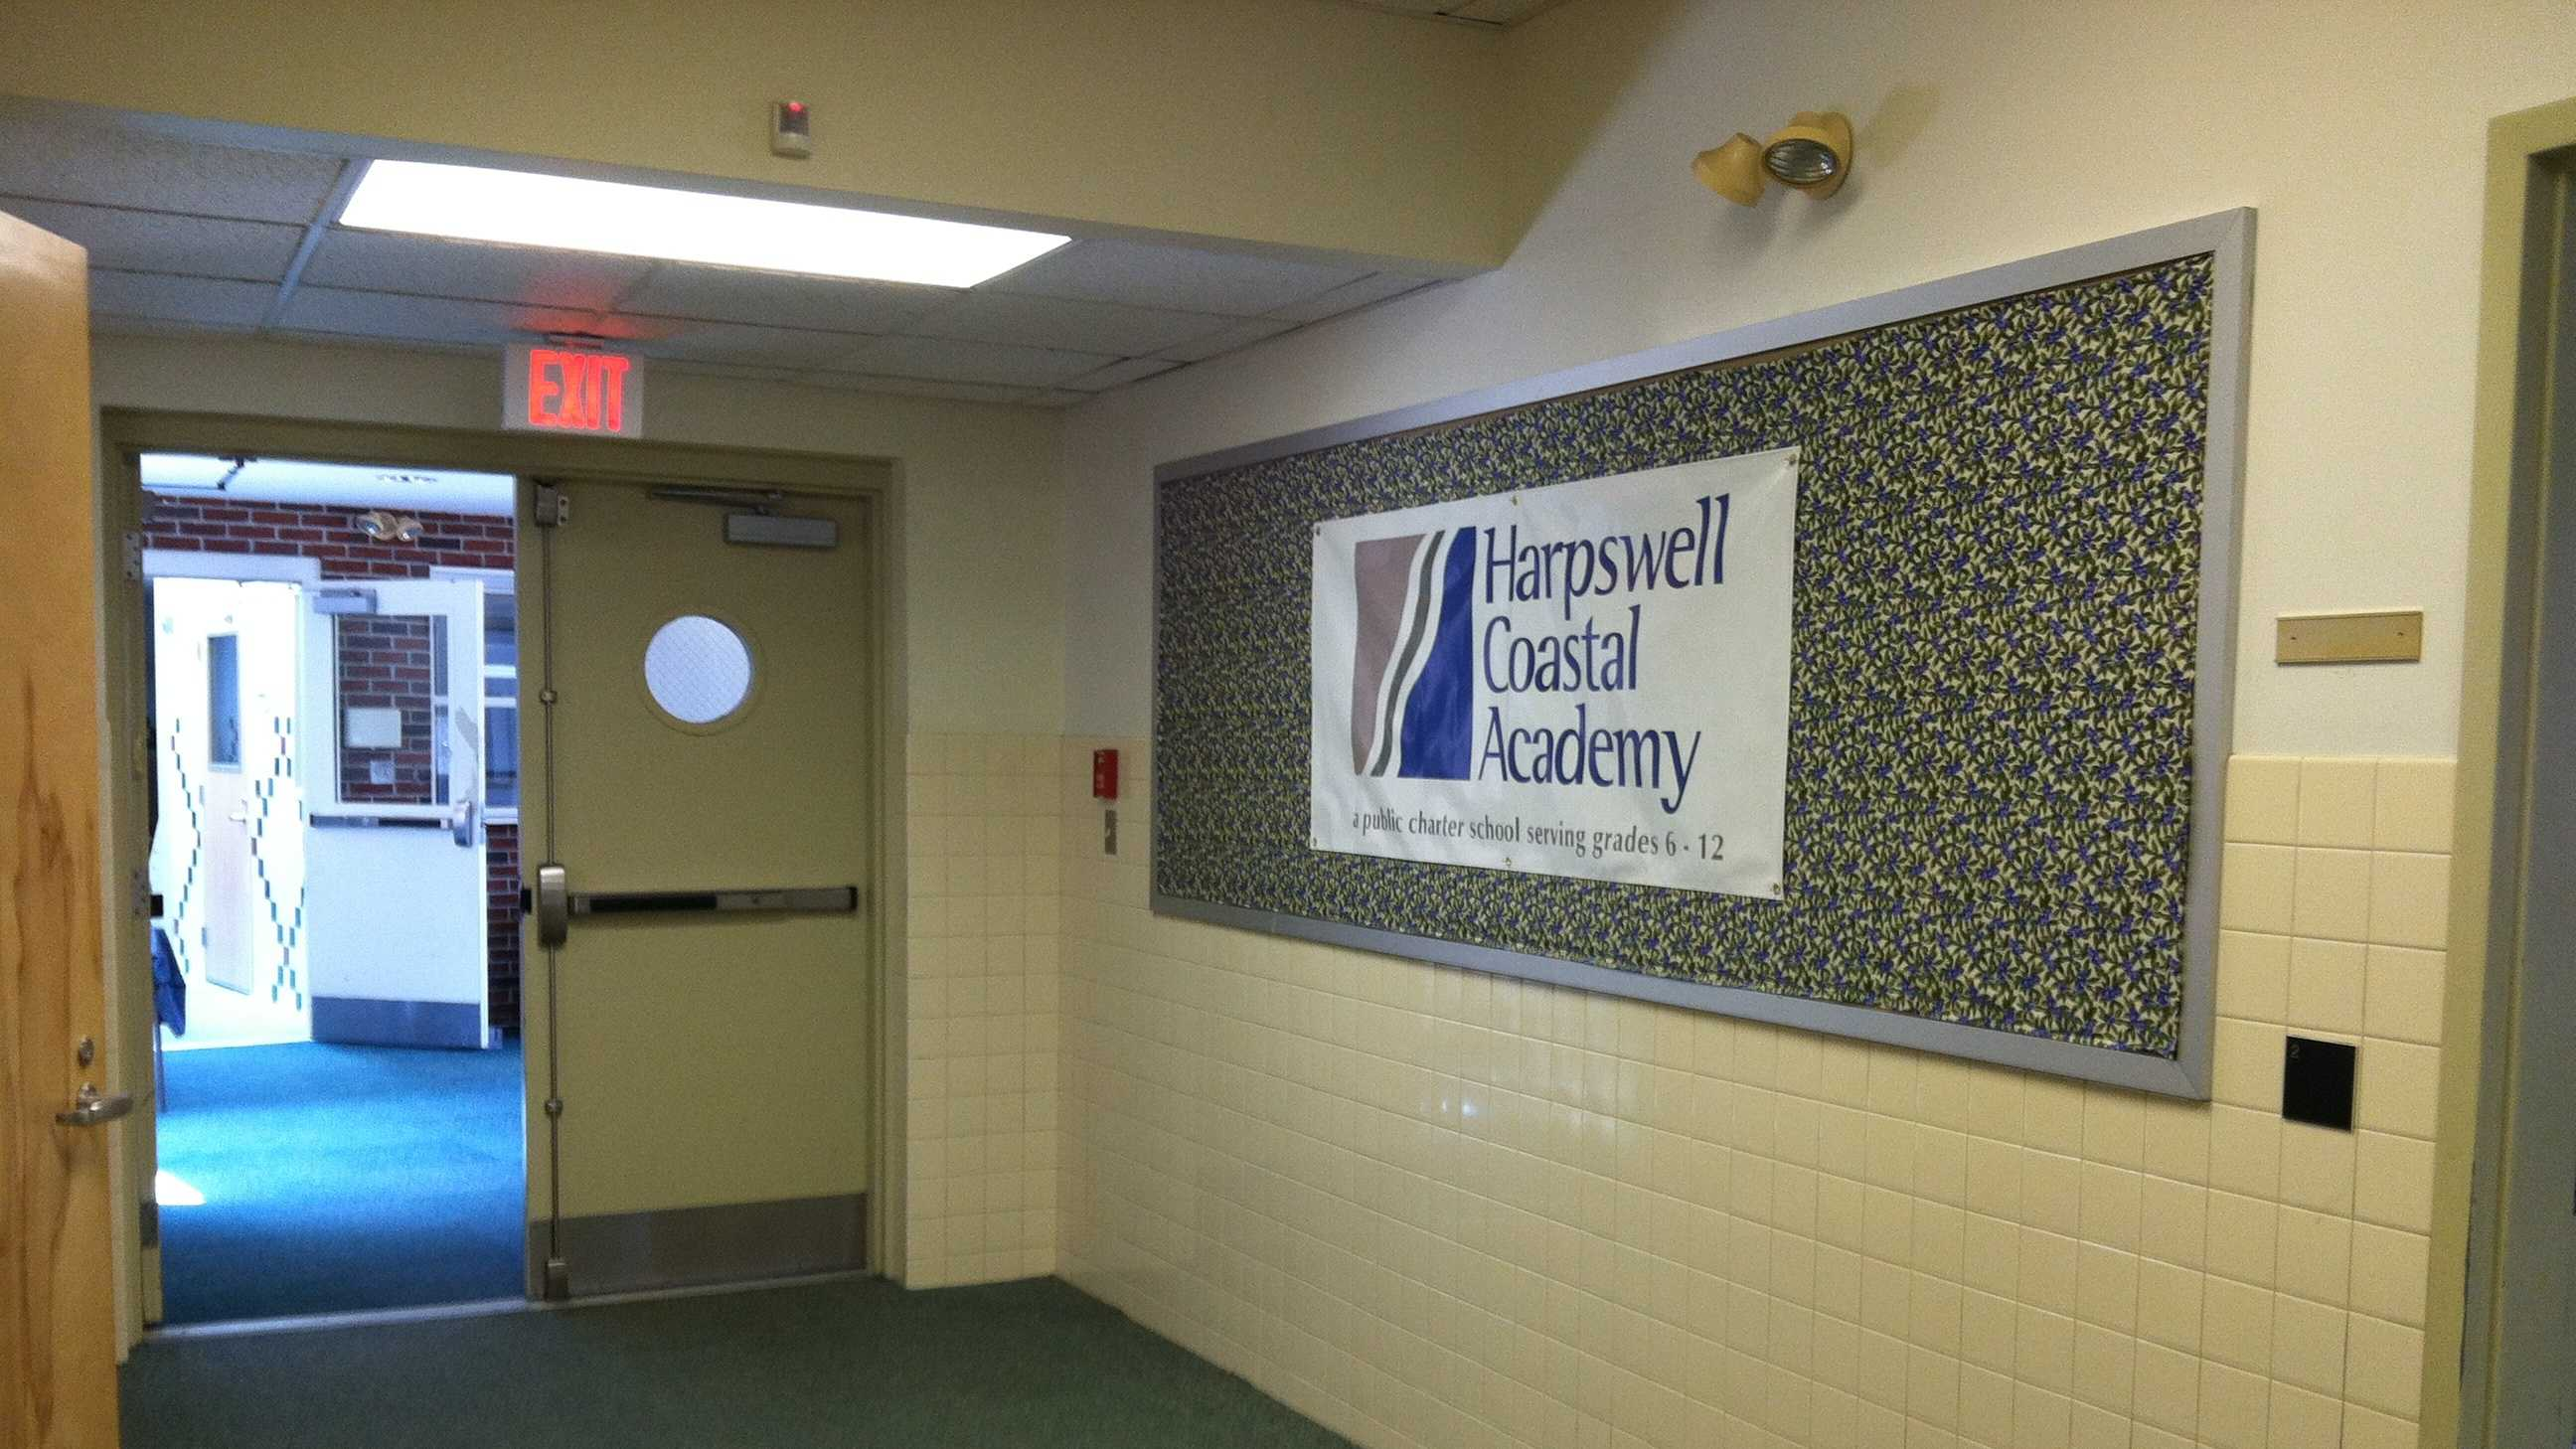 Harpswell Charter School